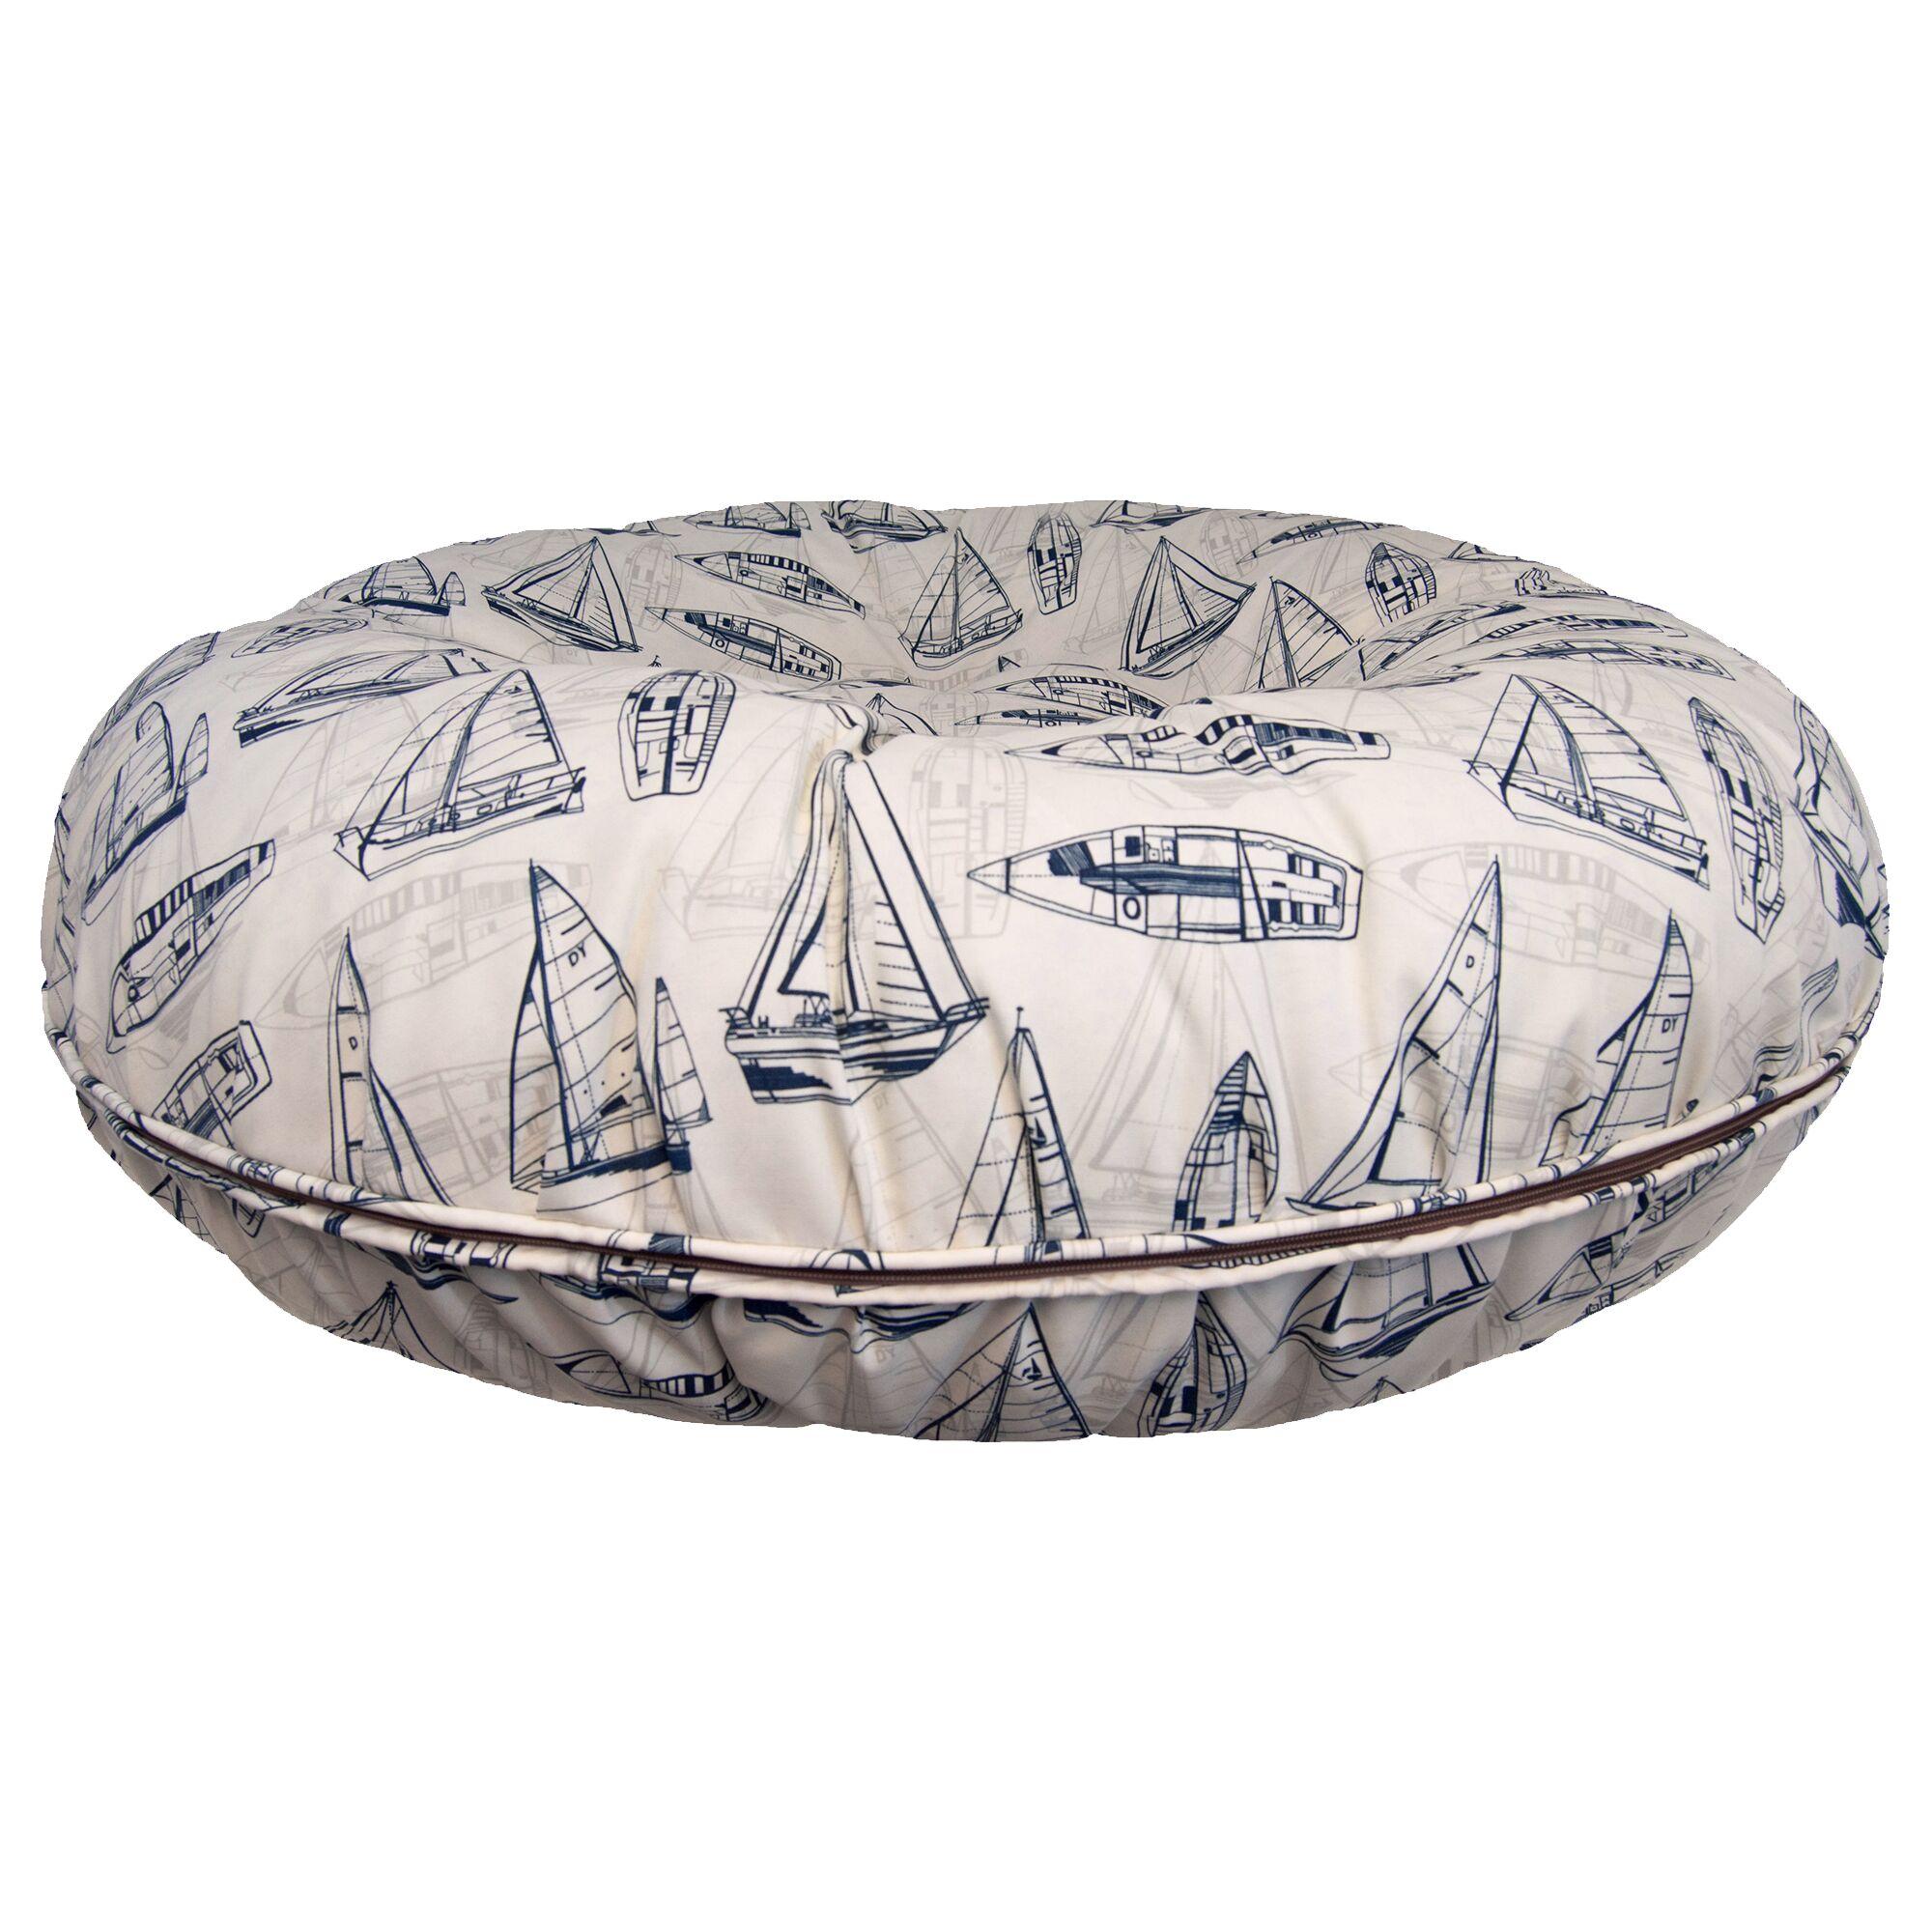 Bagel Navy Sail Boat Pillow Size: Medium (36